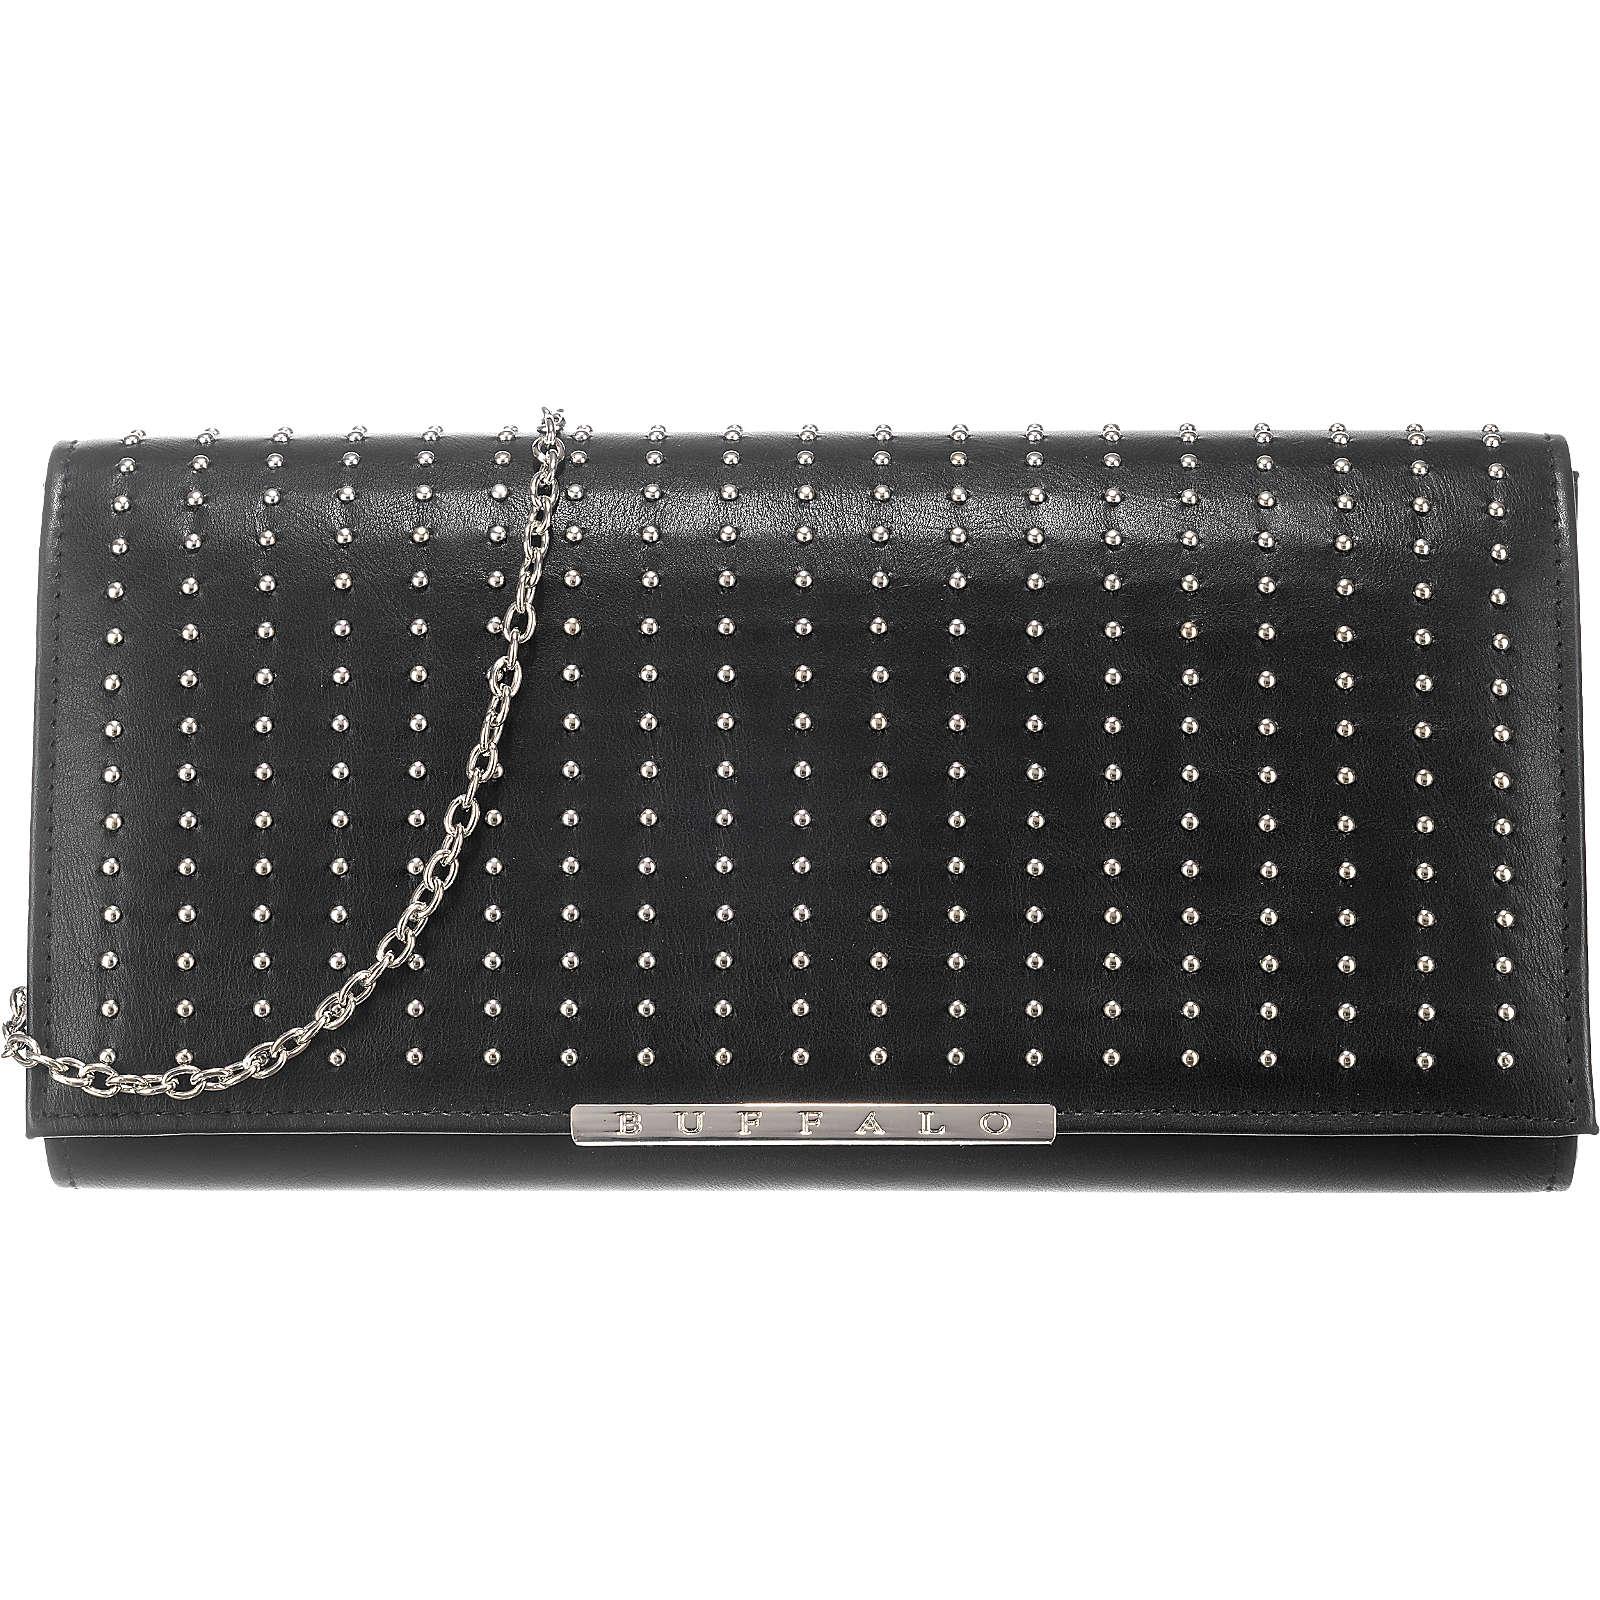 BUFFALO Abendtasche schwarz Damen bei Mirapodo - Neue Styles